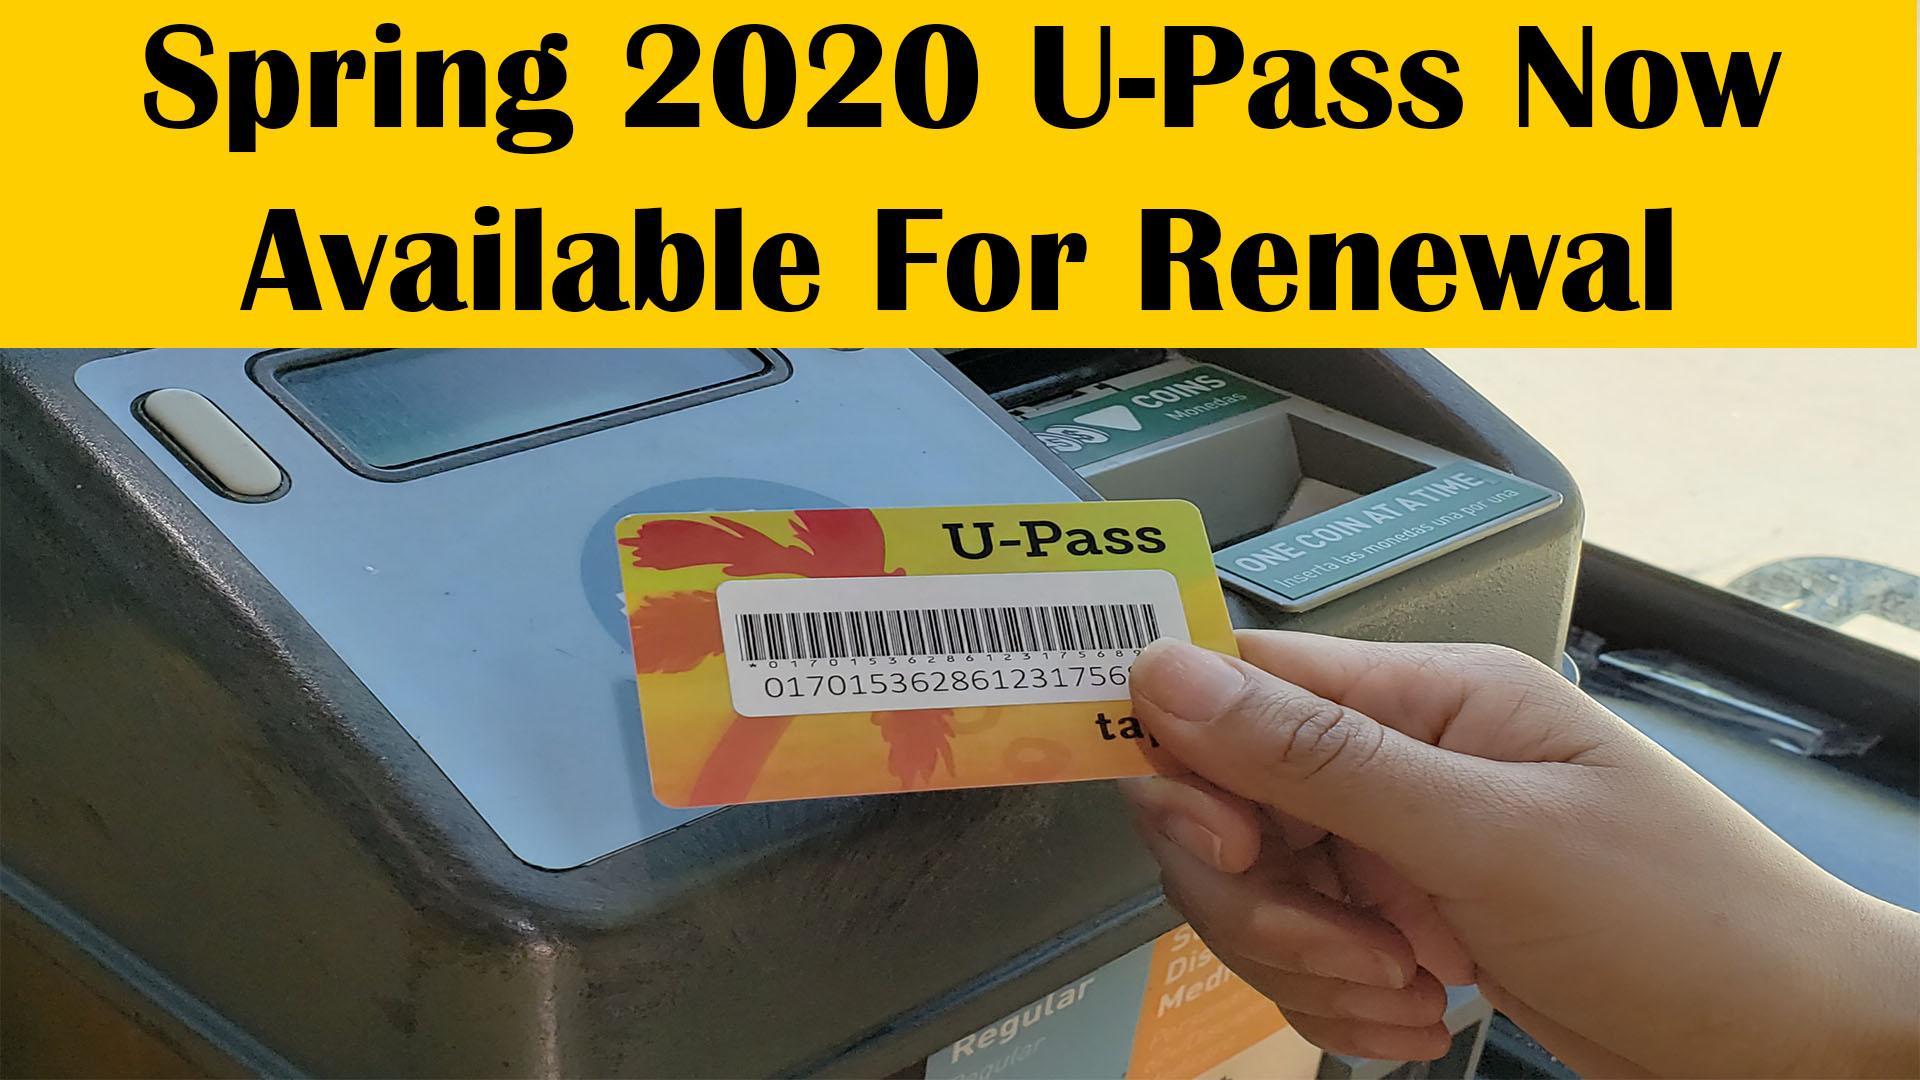 Spring 2020 U-Pass Information